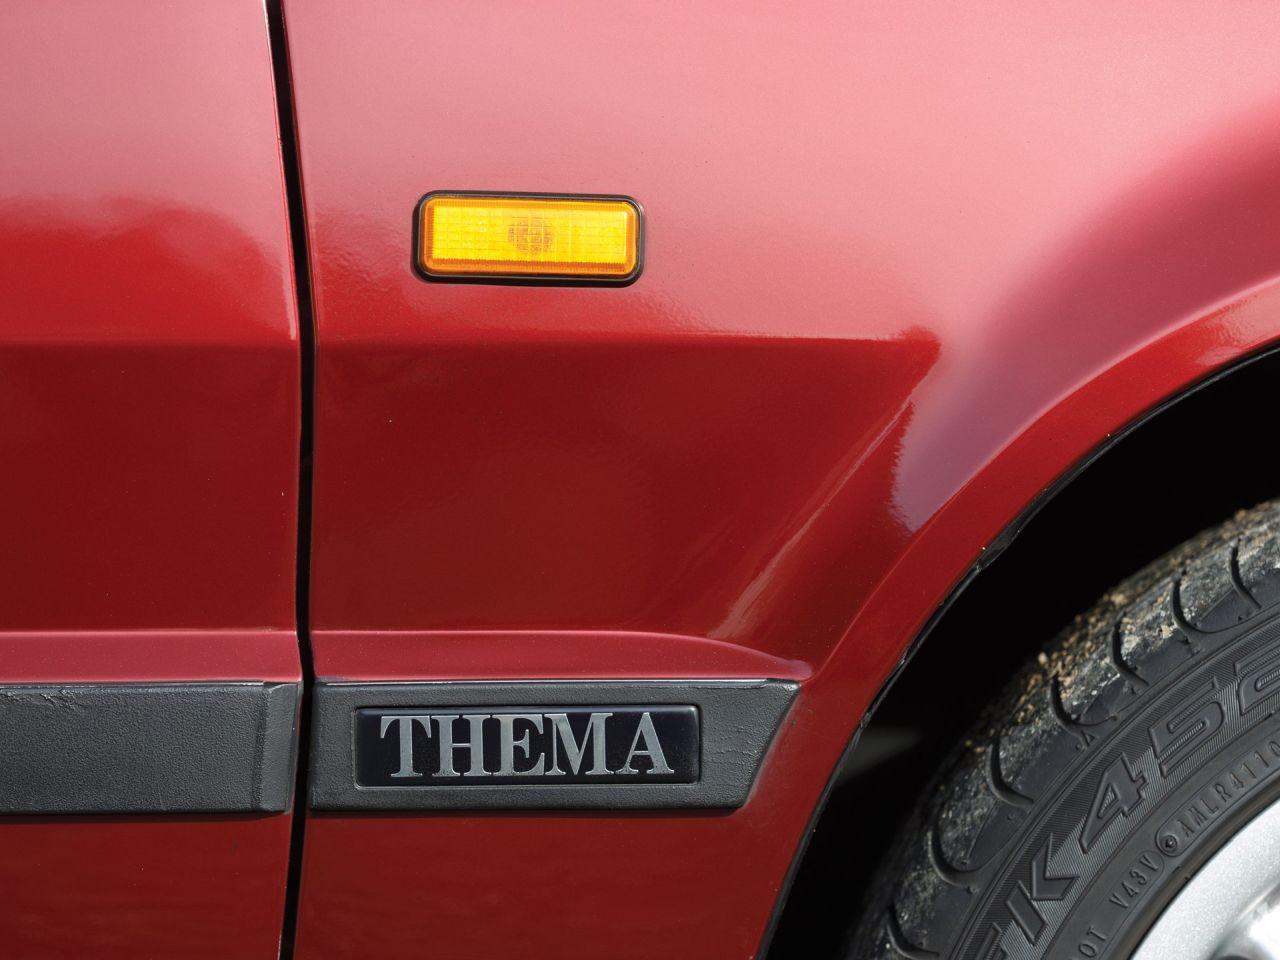 Lancia Thema 8.32 de 1991 - Costard, champagne... Et frustration ! 26